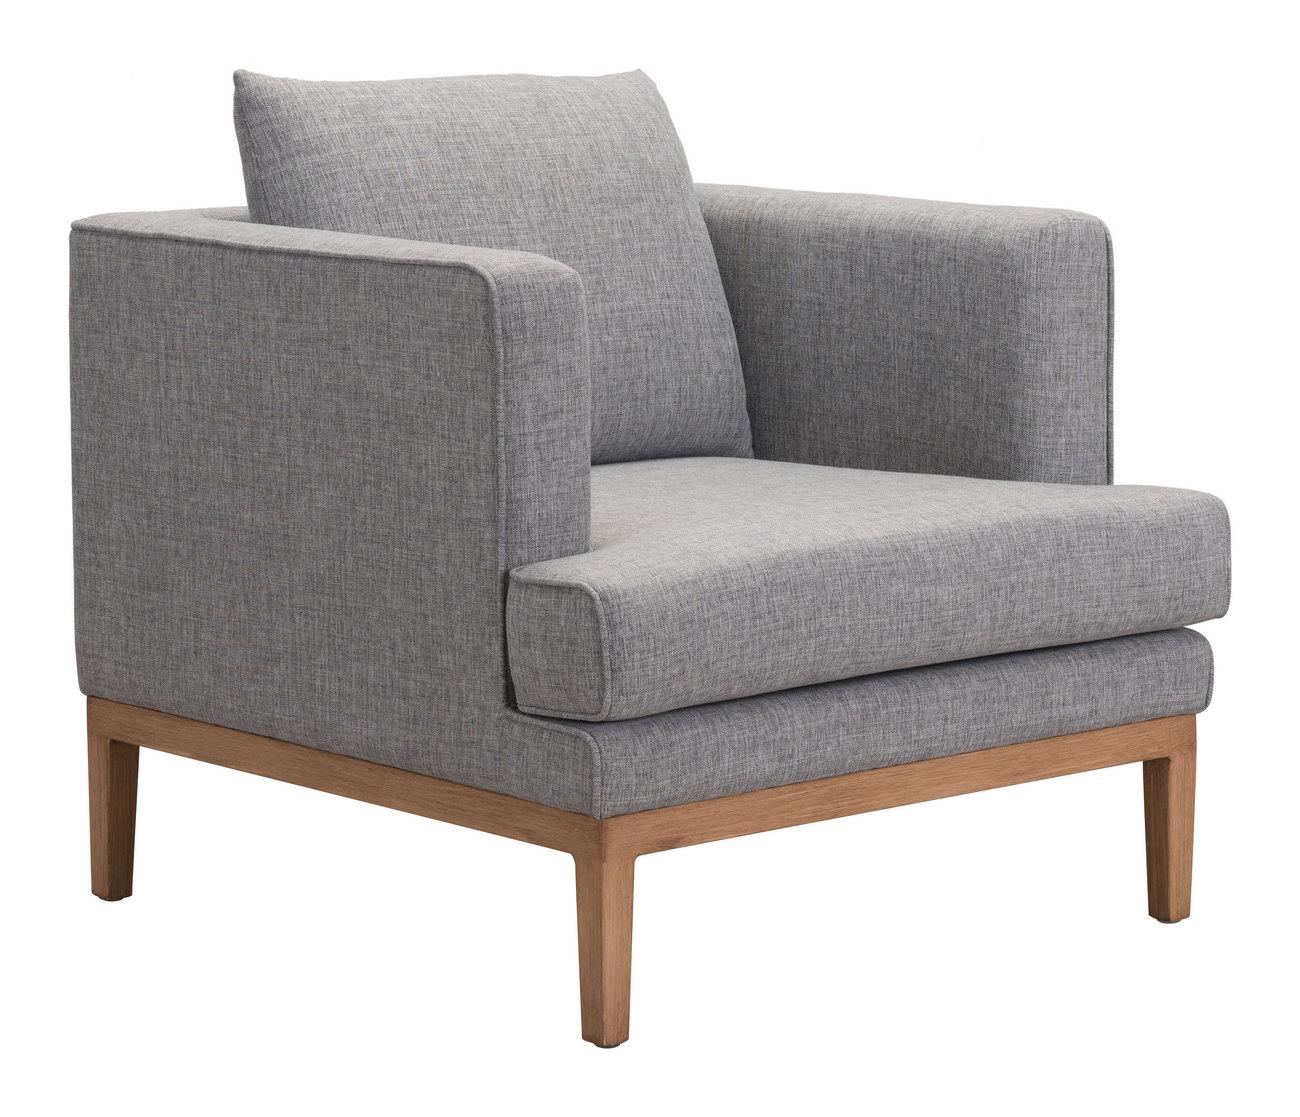 Zuo Eden Arm Chair Gray